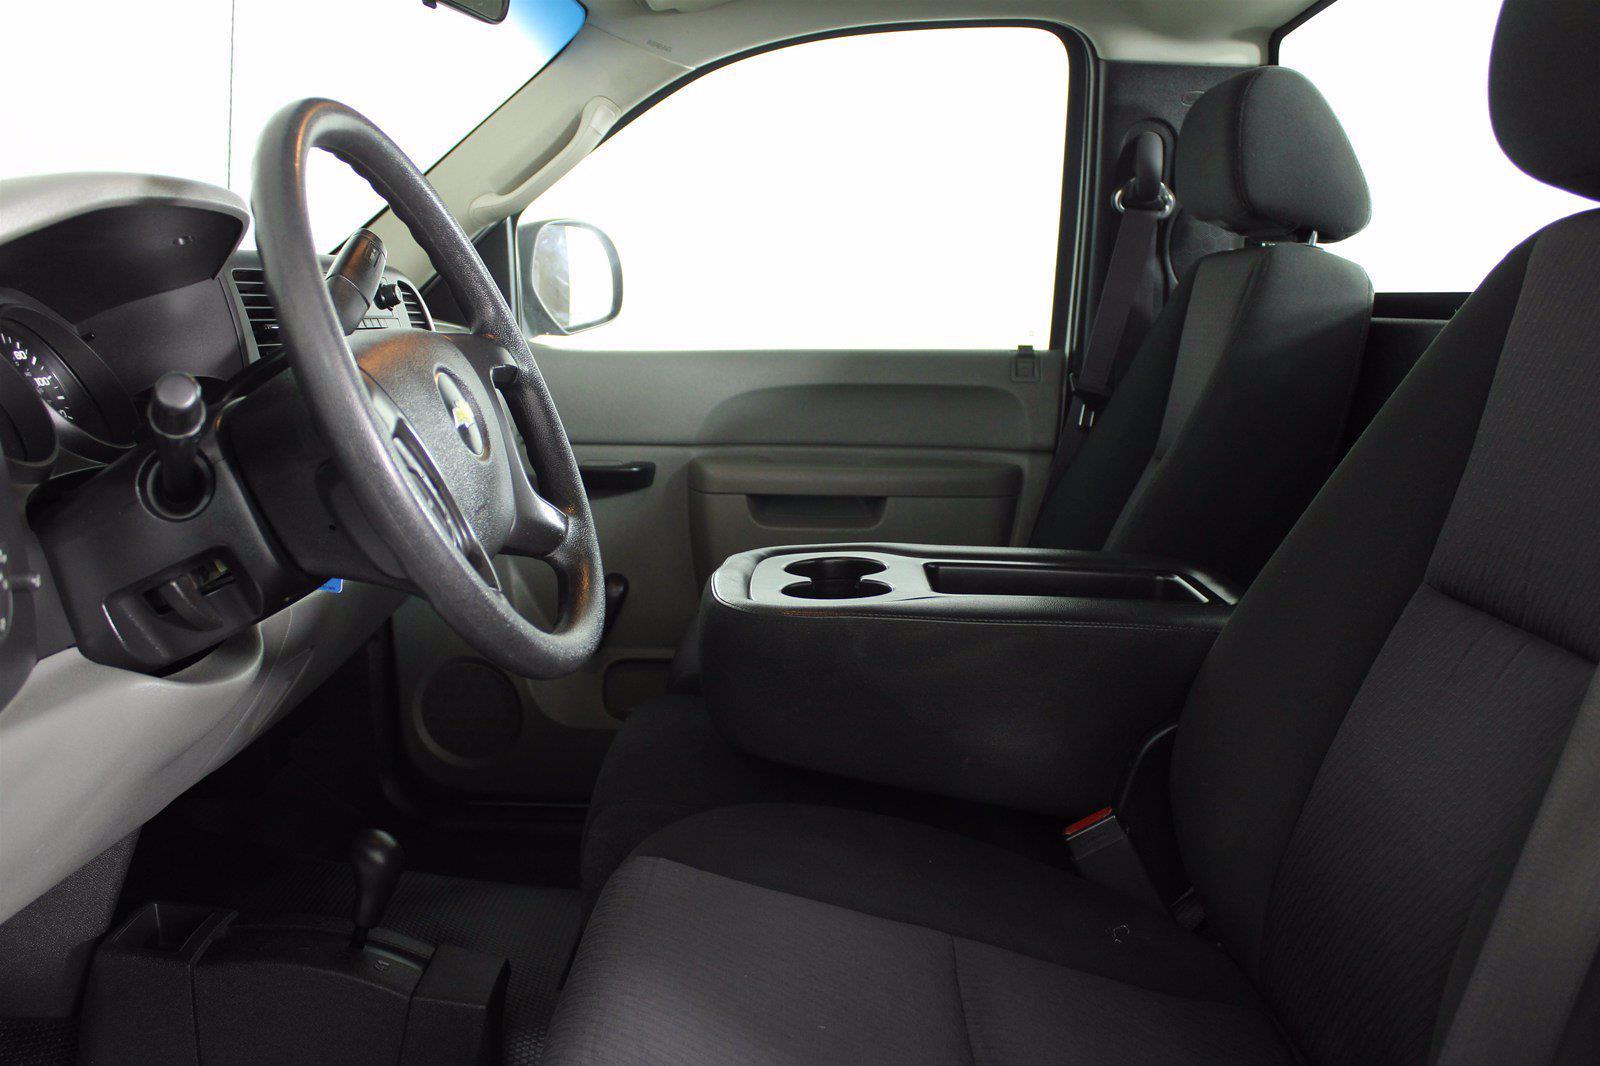 2012 Silverado 1500 Regular Cab 4x4,  Pickup #D120034A - photo 19